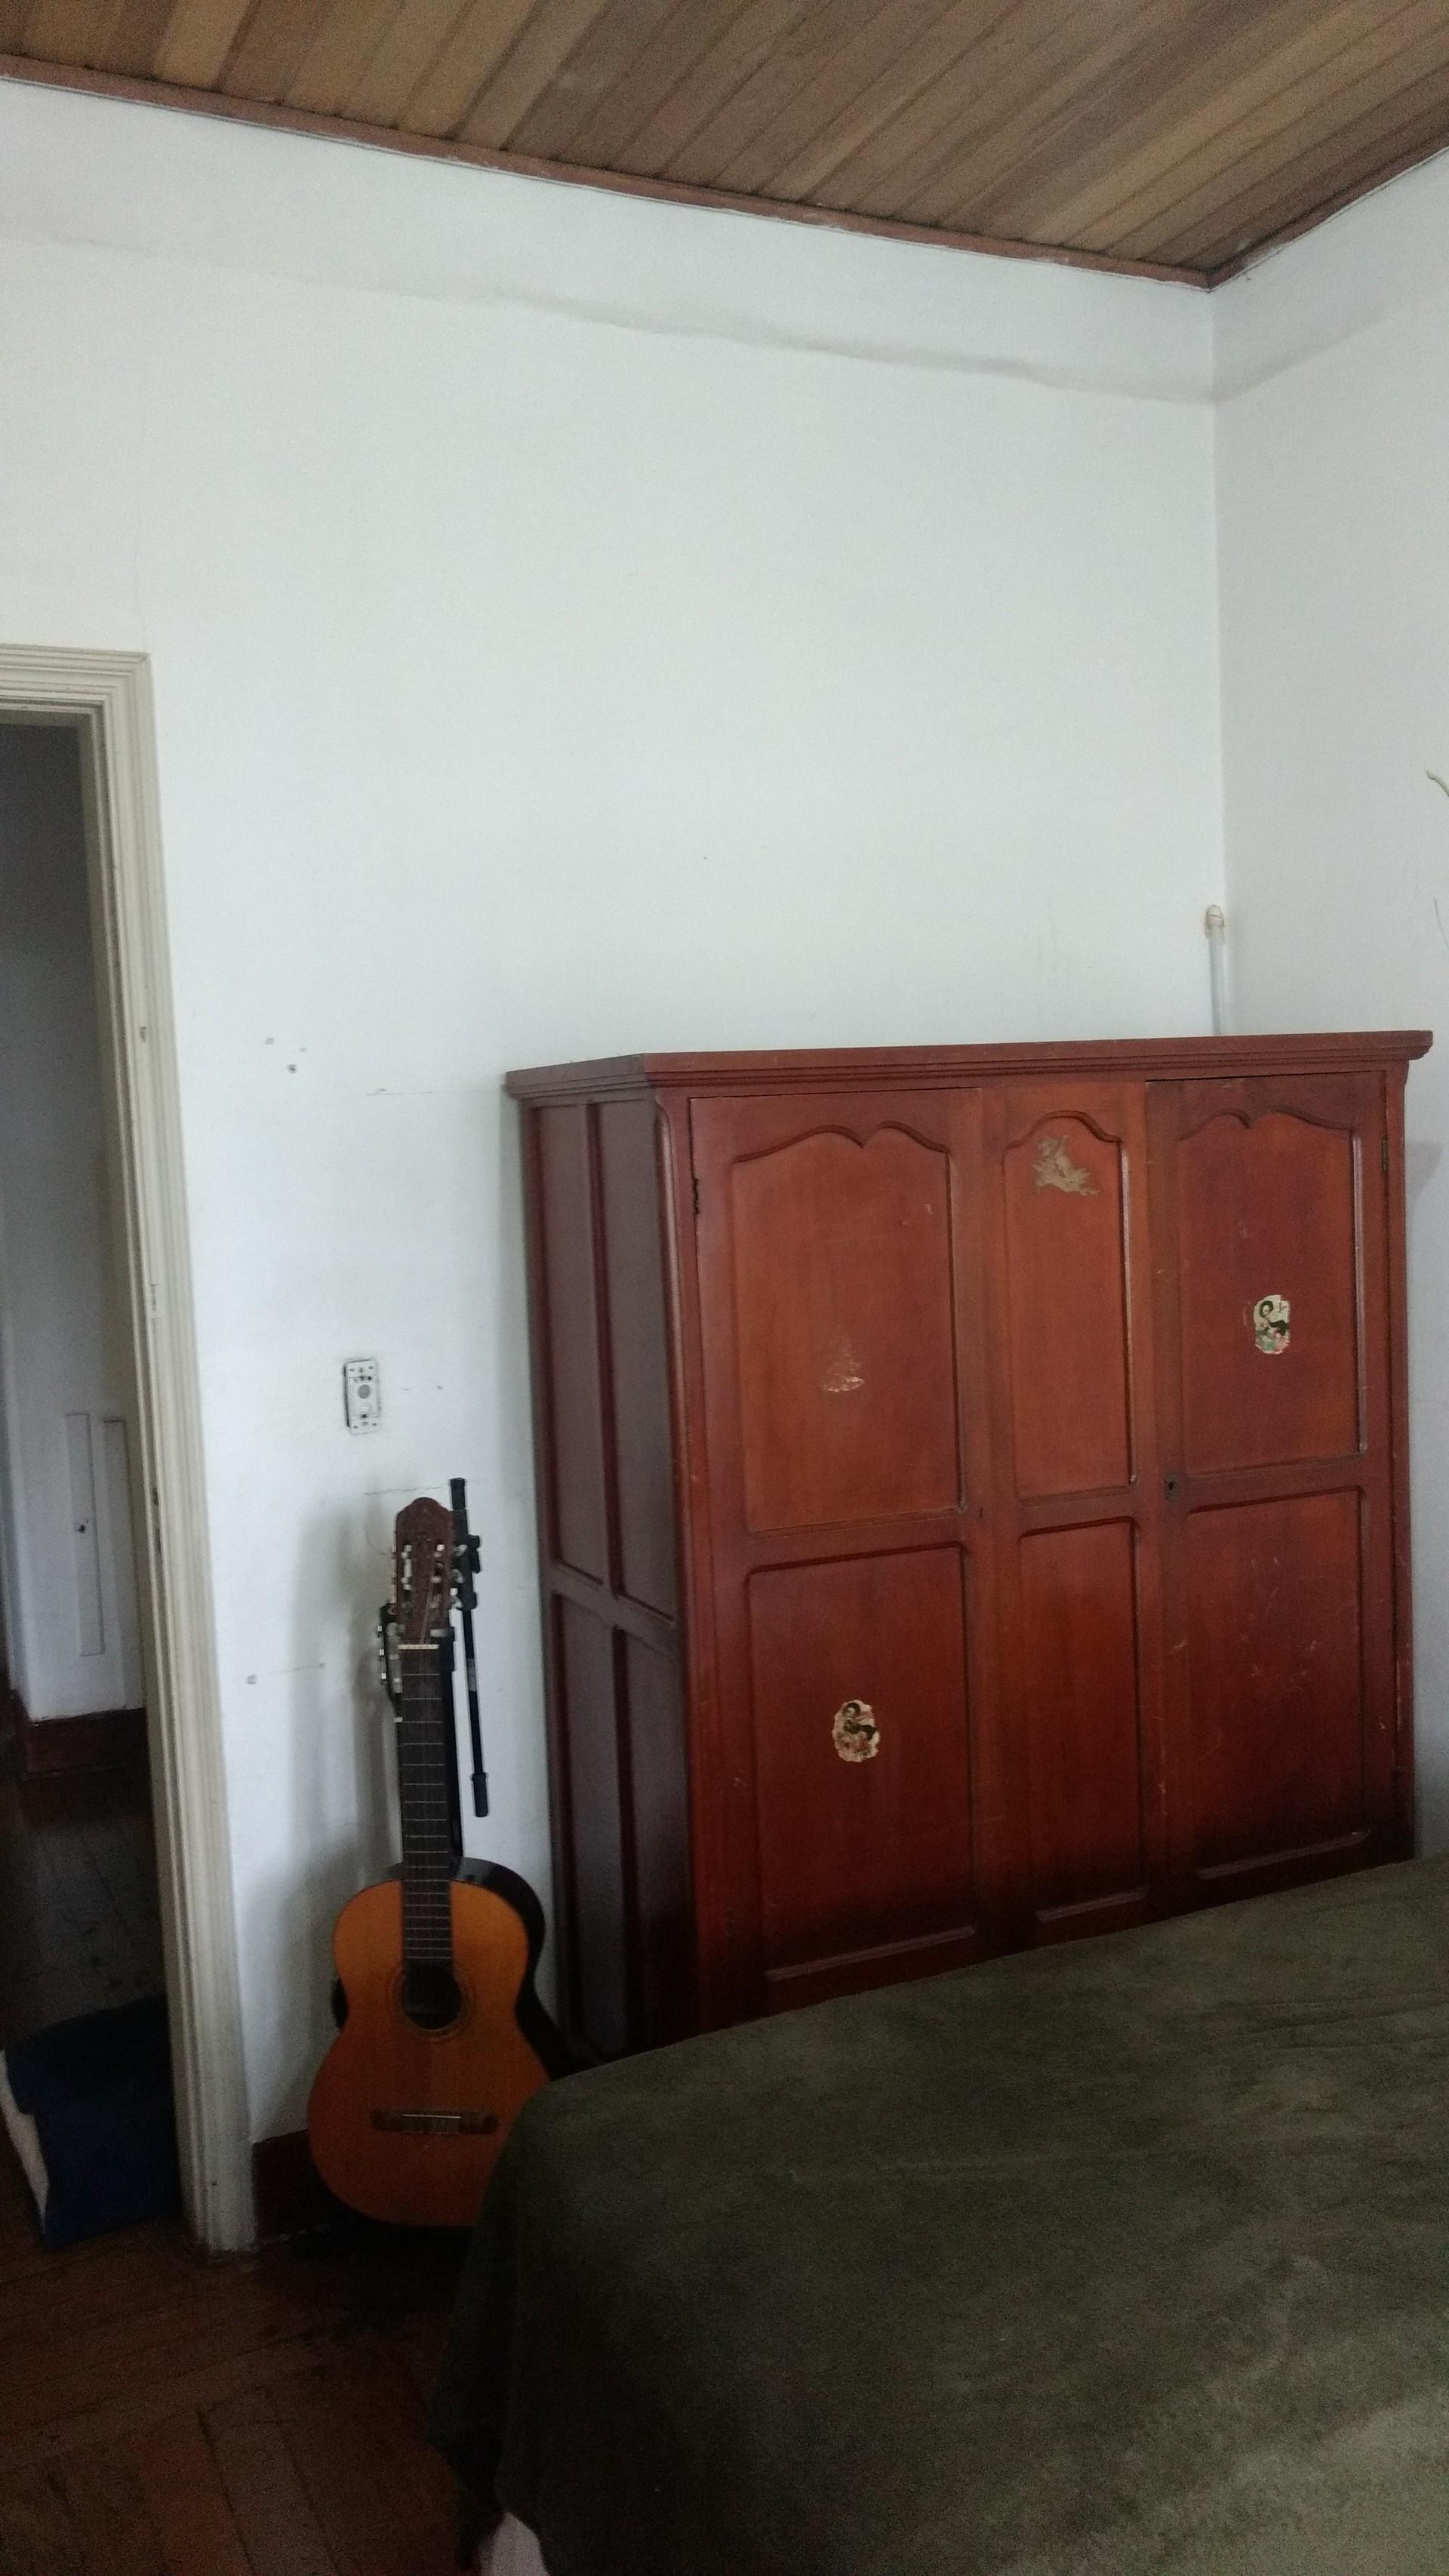 i-offer-room-family-house-shared-access-bathroom-kitchen-lunch-room-dining-room-tv-room-wifi-e449a1f2cb5f16e6325e64e2b4d23556